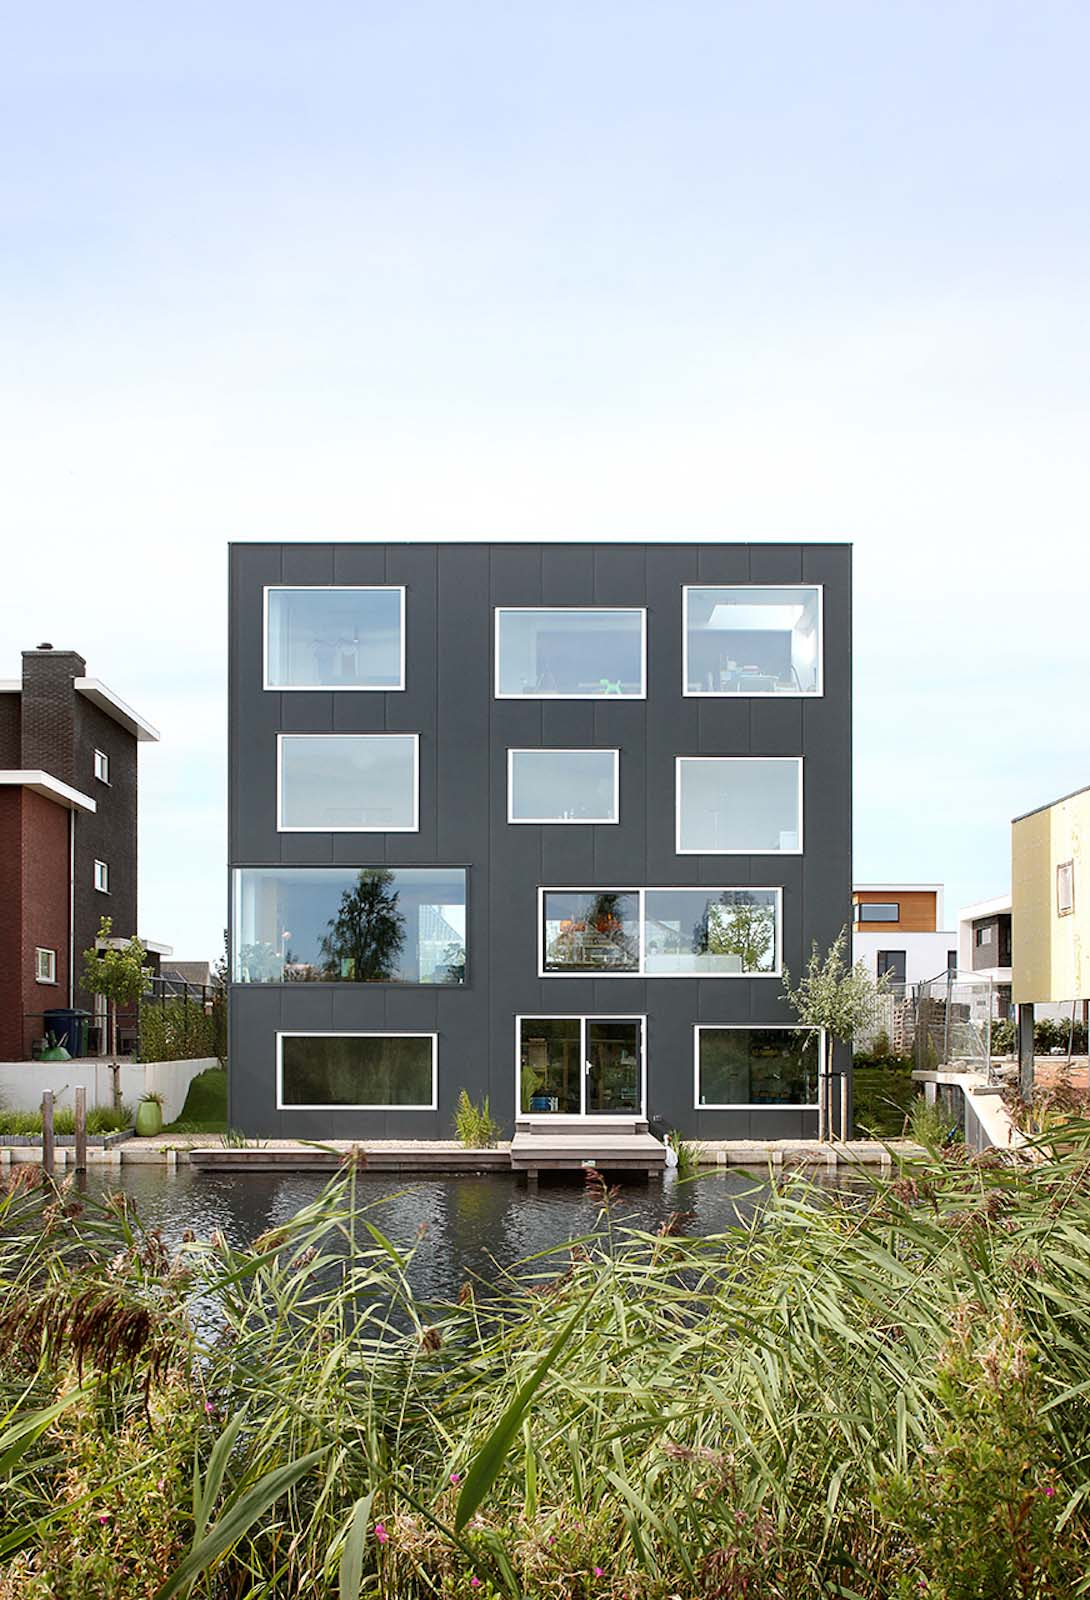 ignant_architecture_mka_woning_almere_small_02